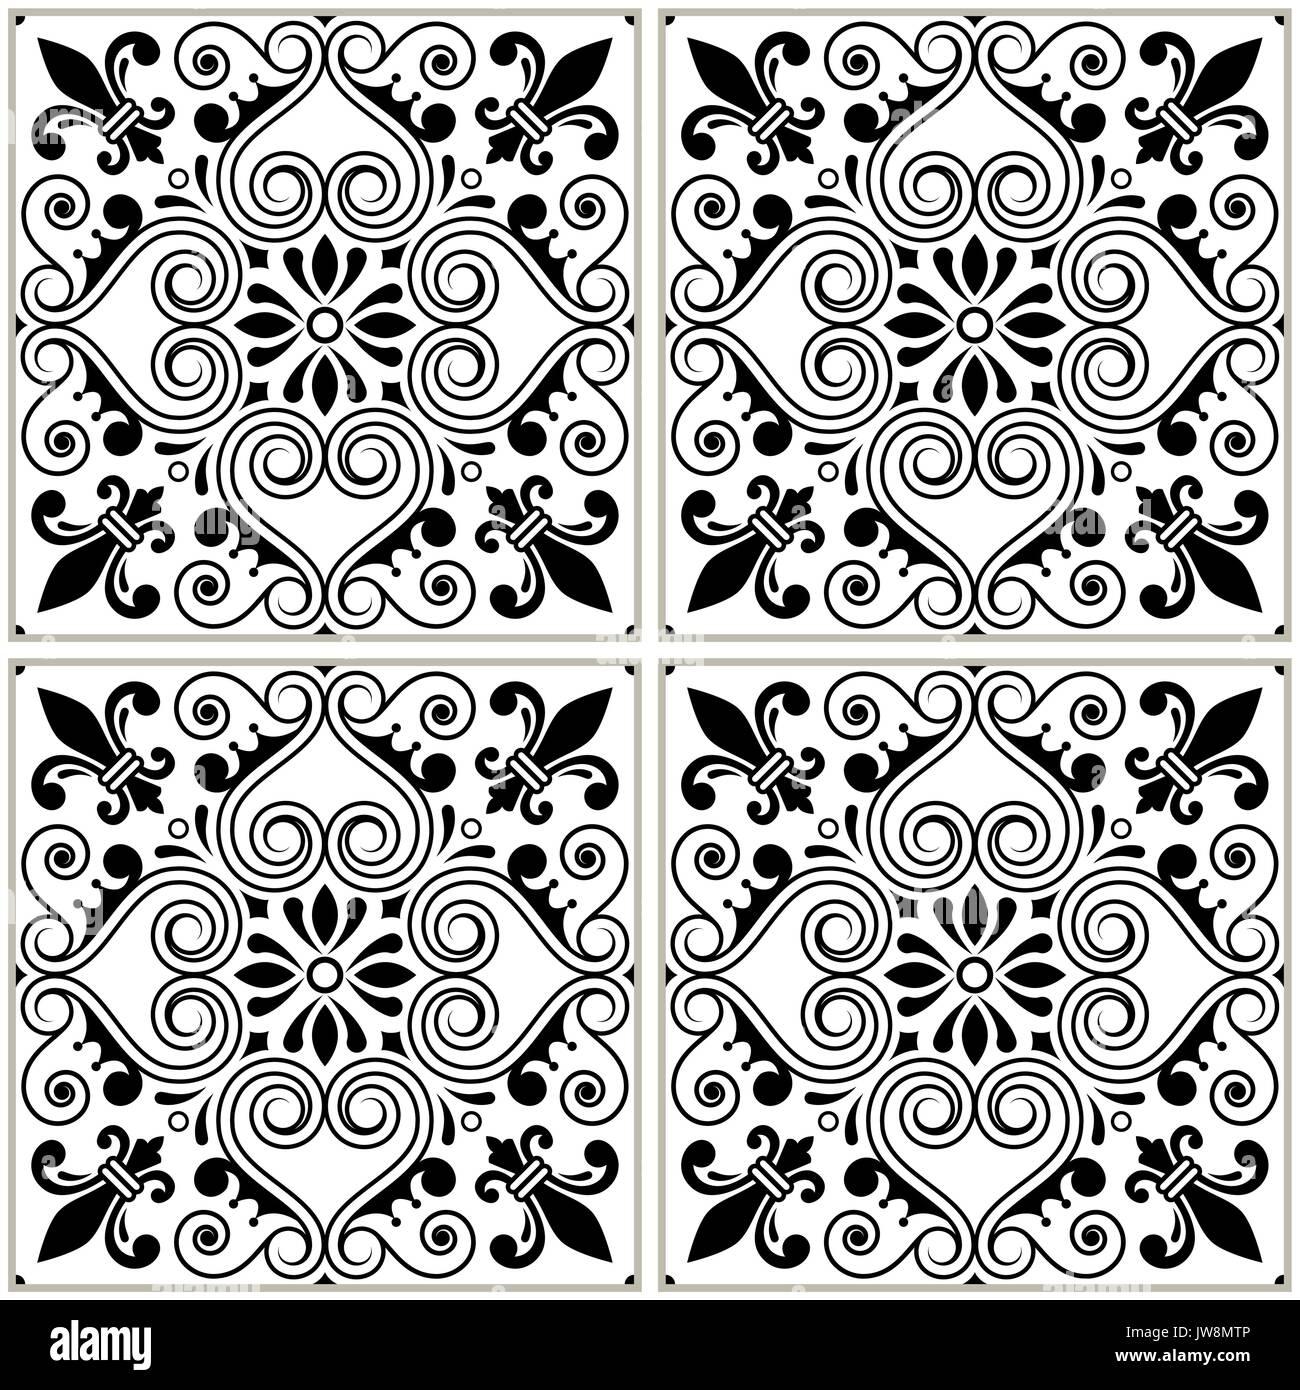 Portuguese tiles pattern - Azulejo black and white design, seamless vector blue background, vintage mosaics set - Stock Vector